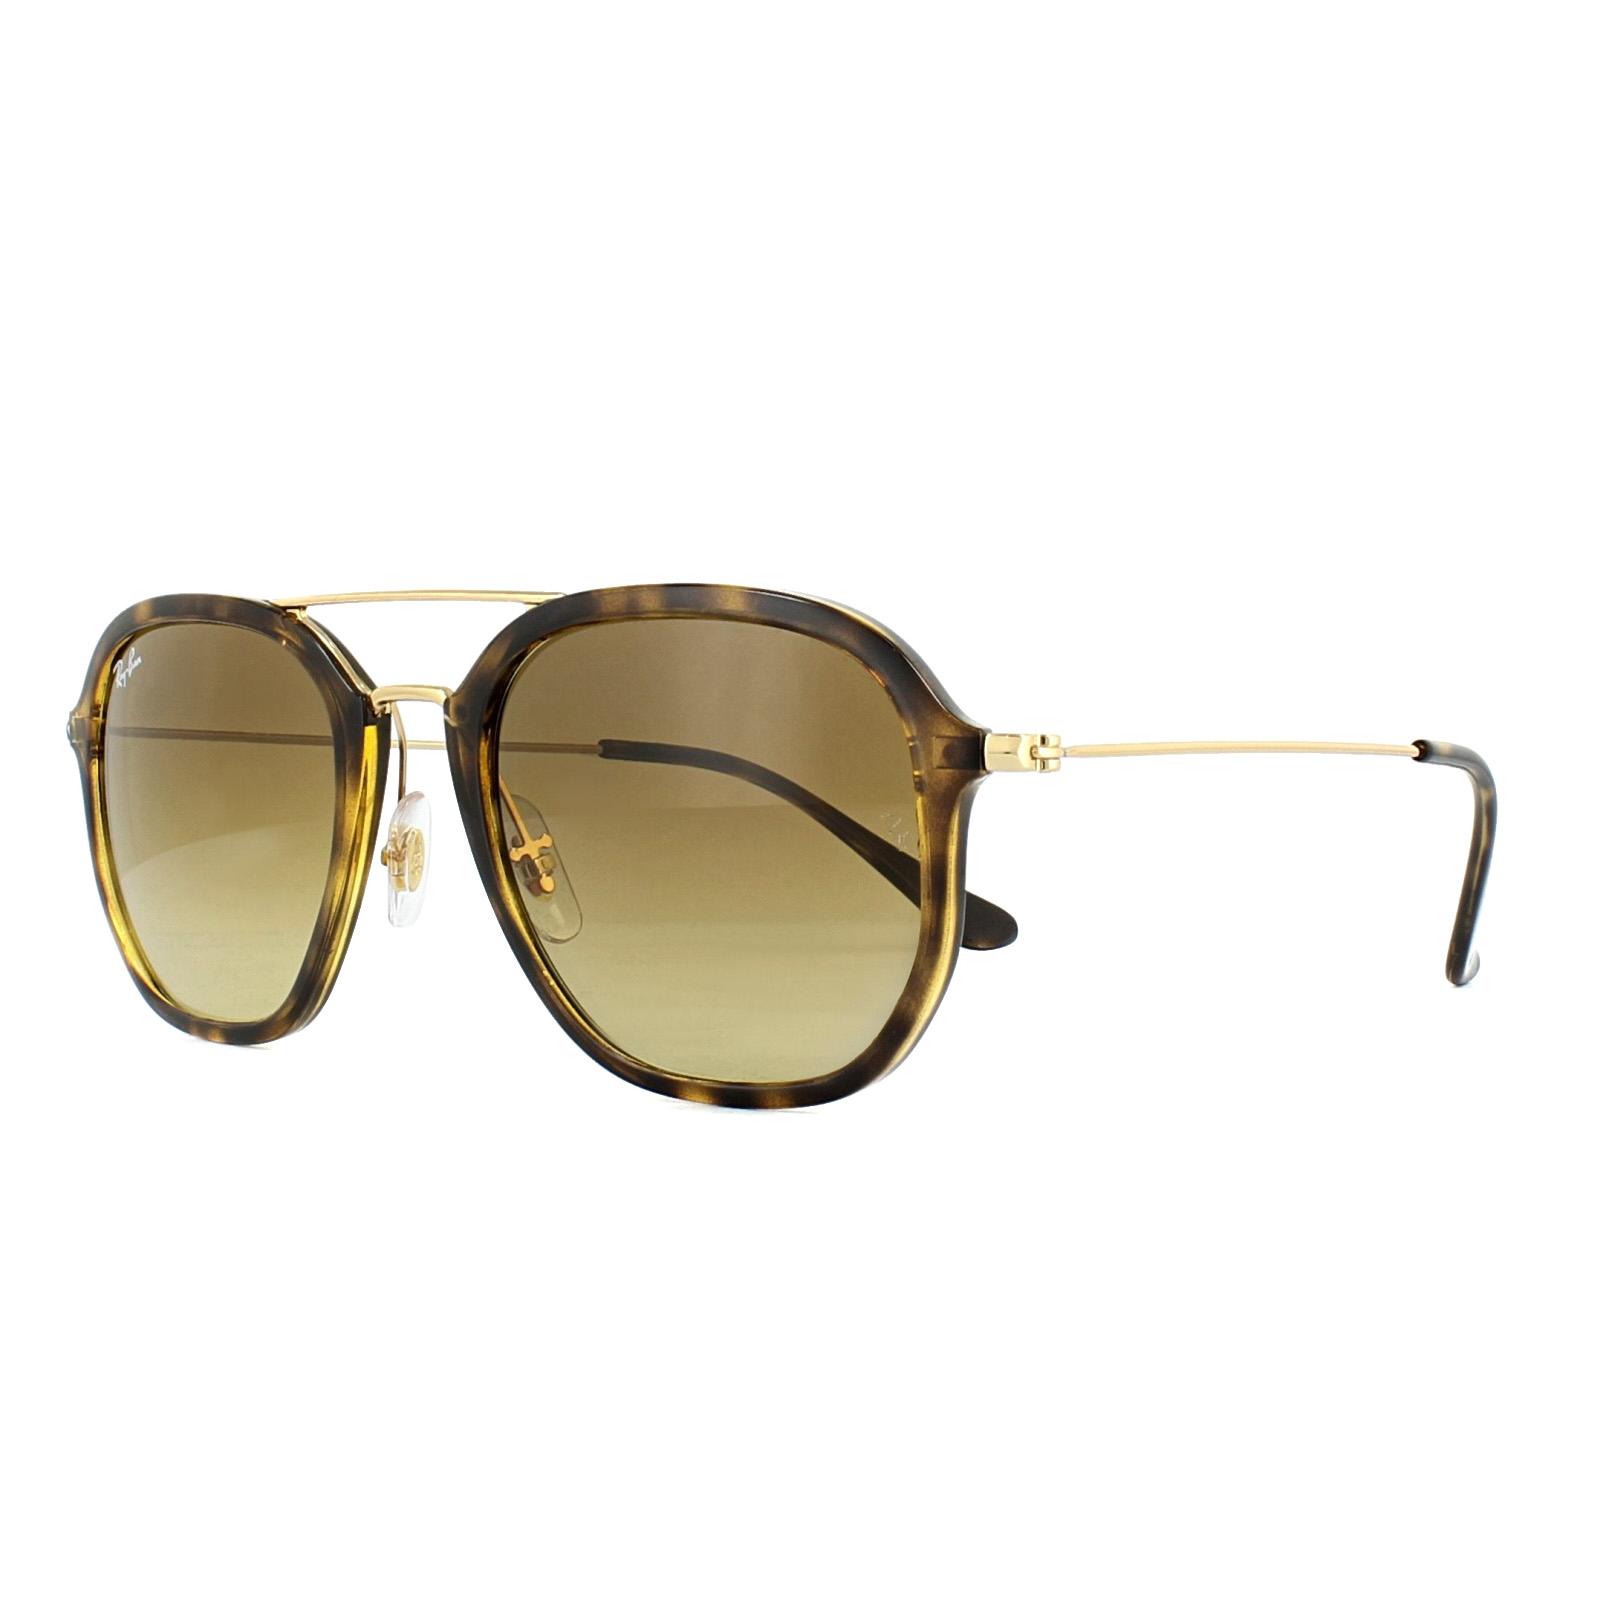 d65b7cfa0f Sentinel Ray-Ban Sunglasses 4273 710 85 Tortoise Gold Brown Gradient